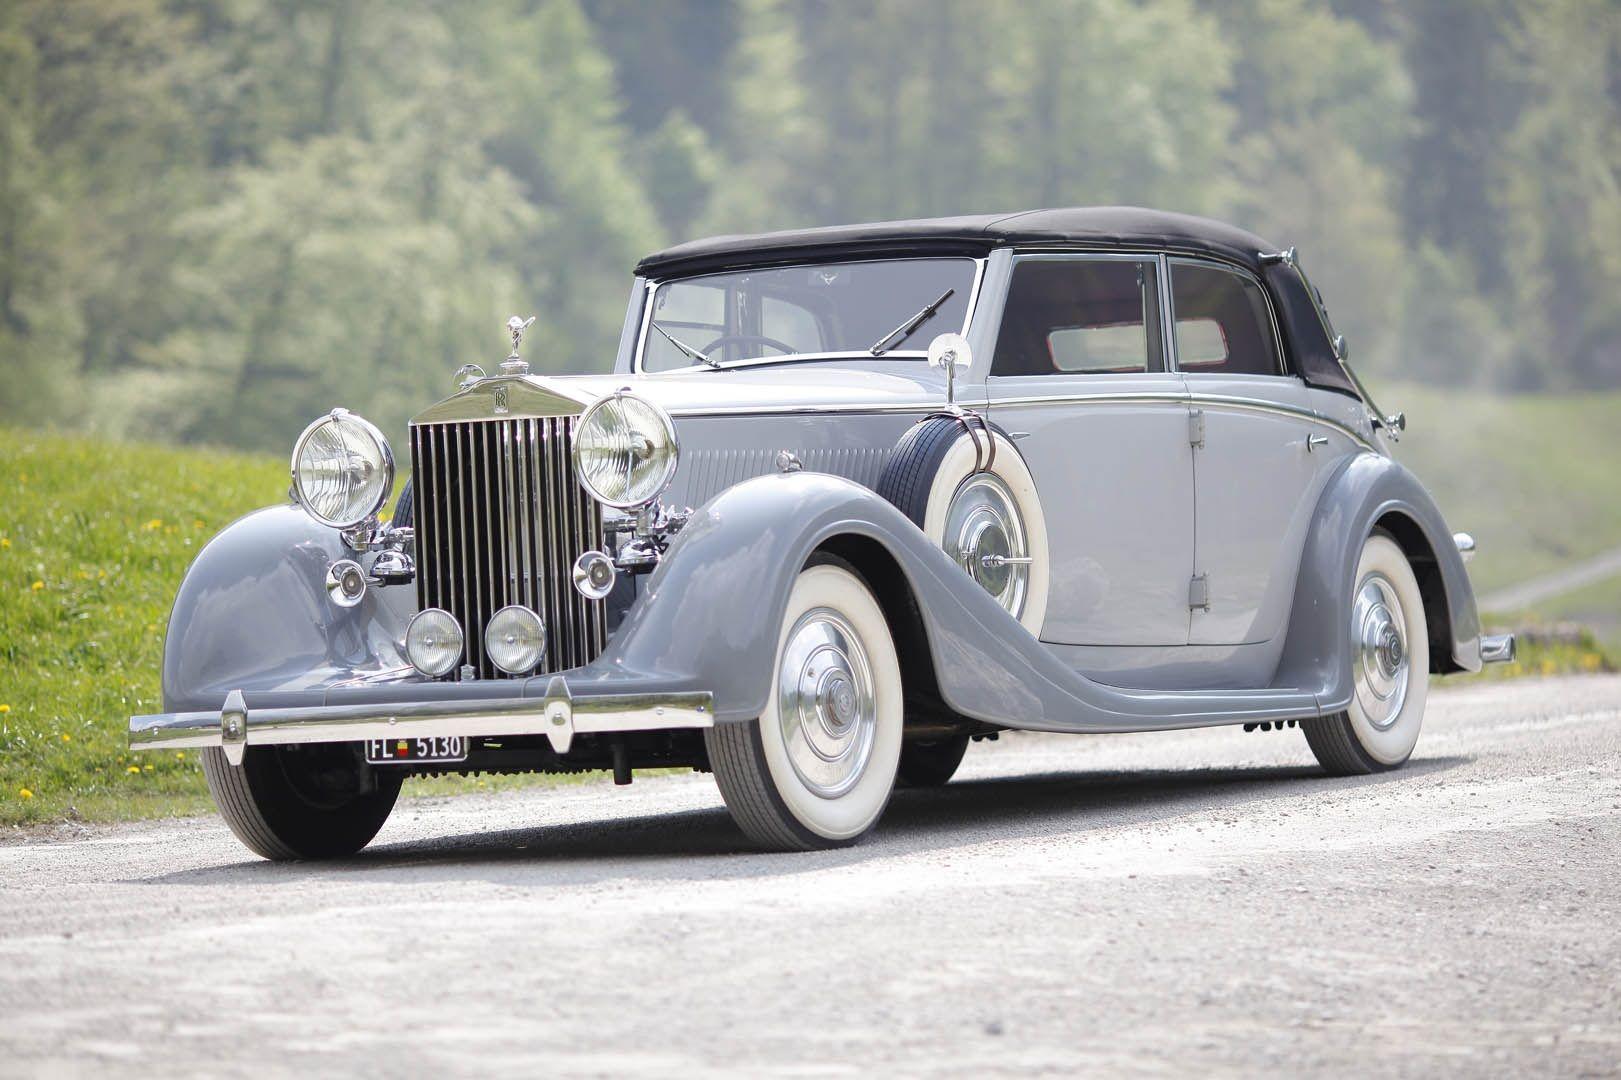 rolls royce phantom iii 1937 vehicles pinterest. Black Bedroom Furniture Sets. Home Design Ideas